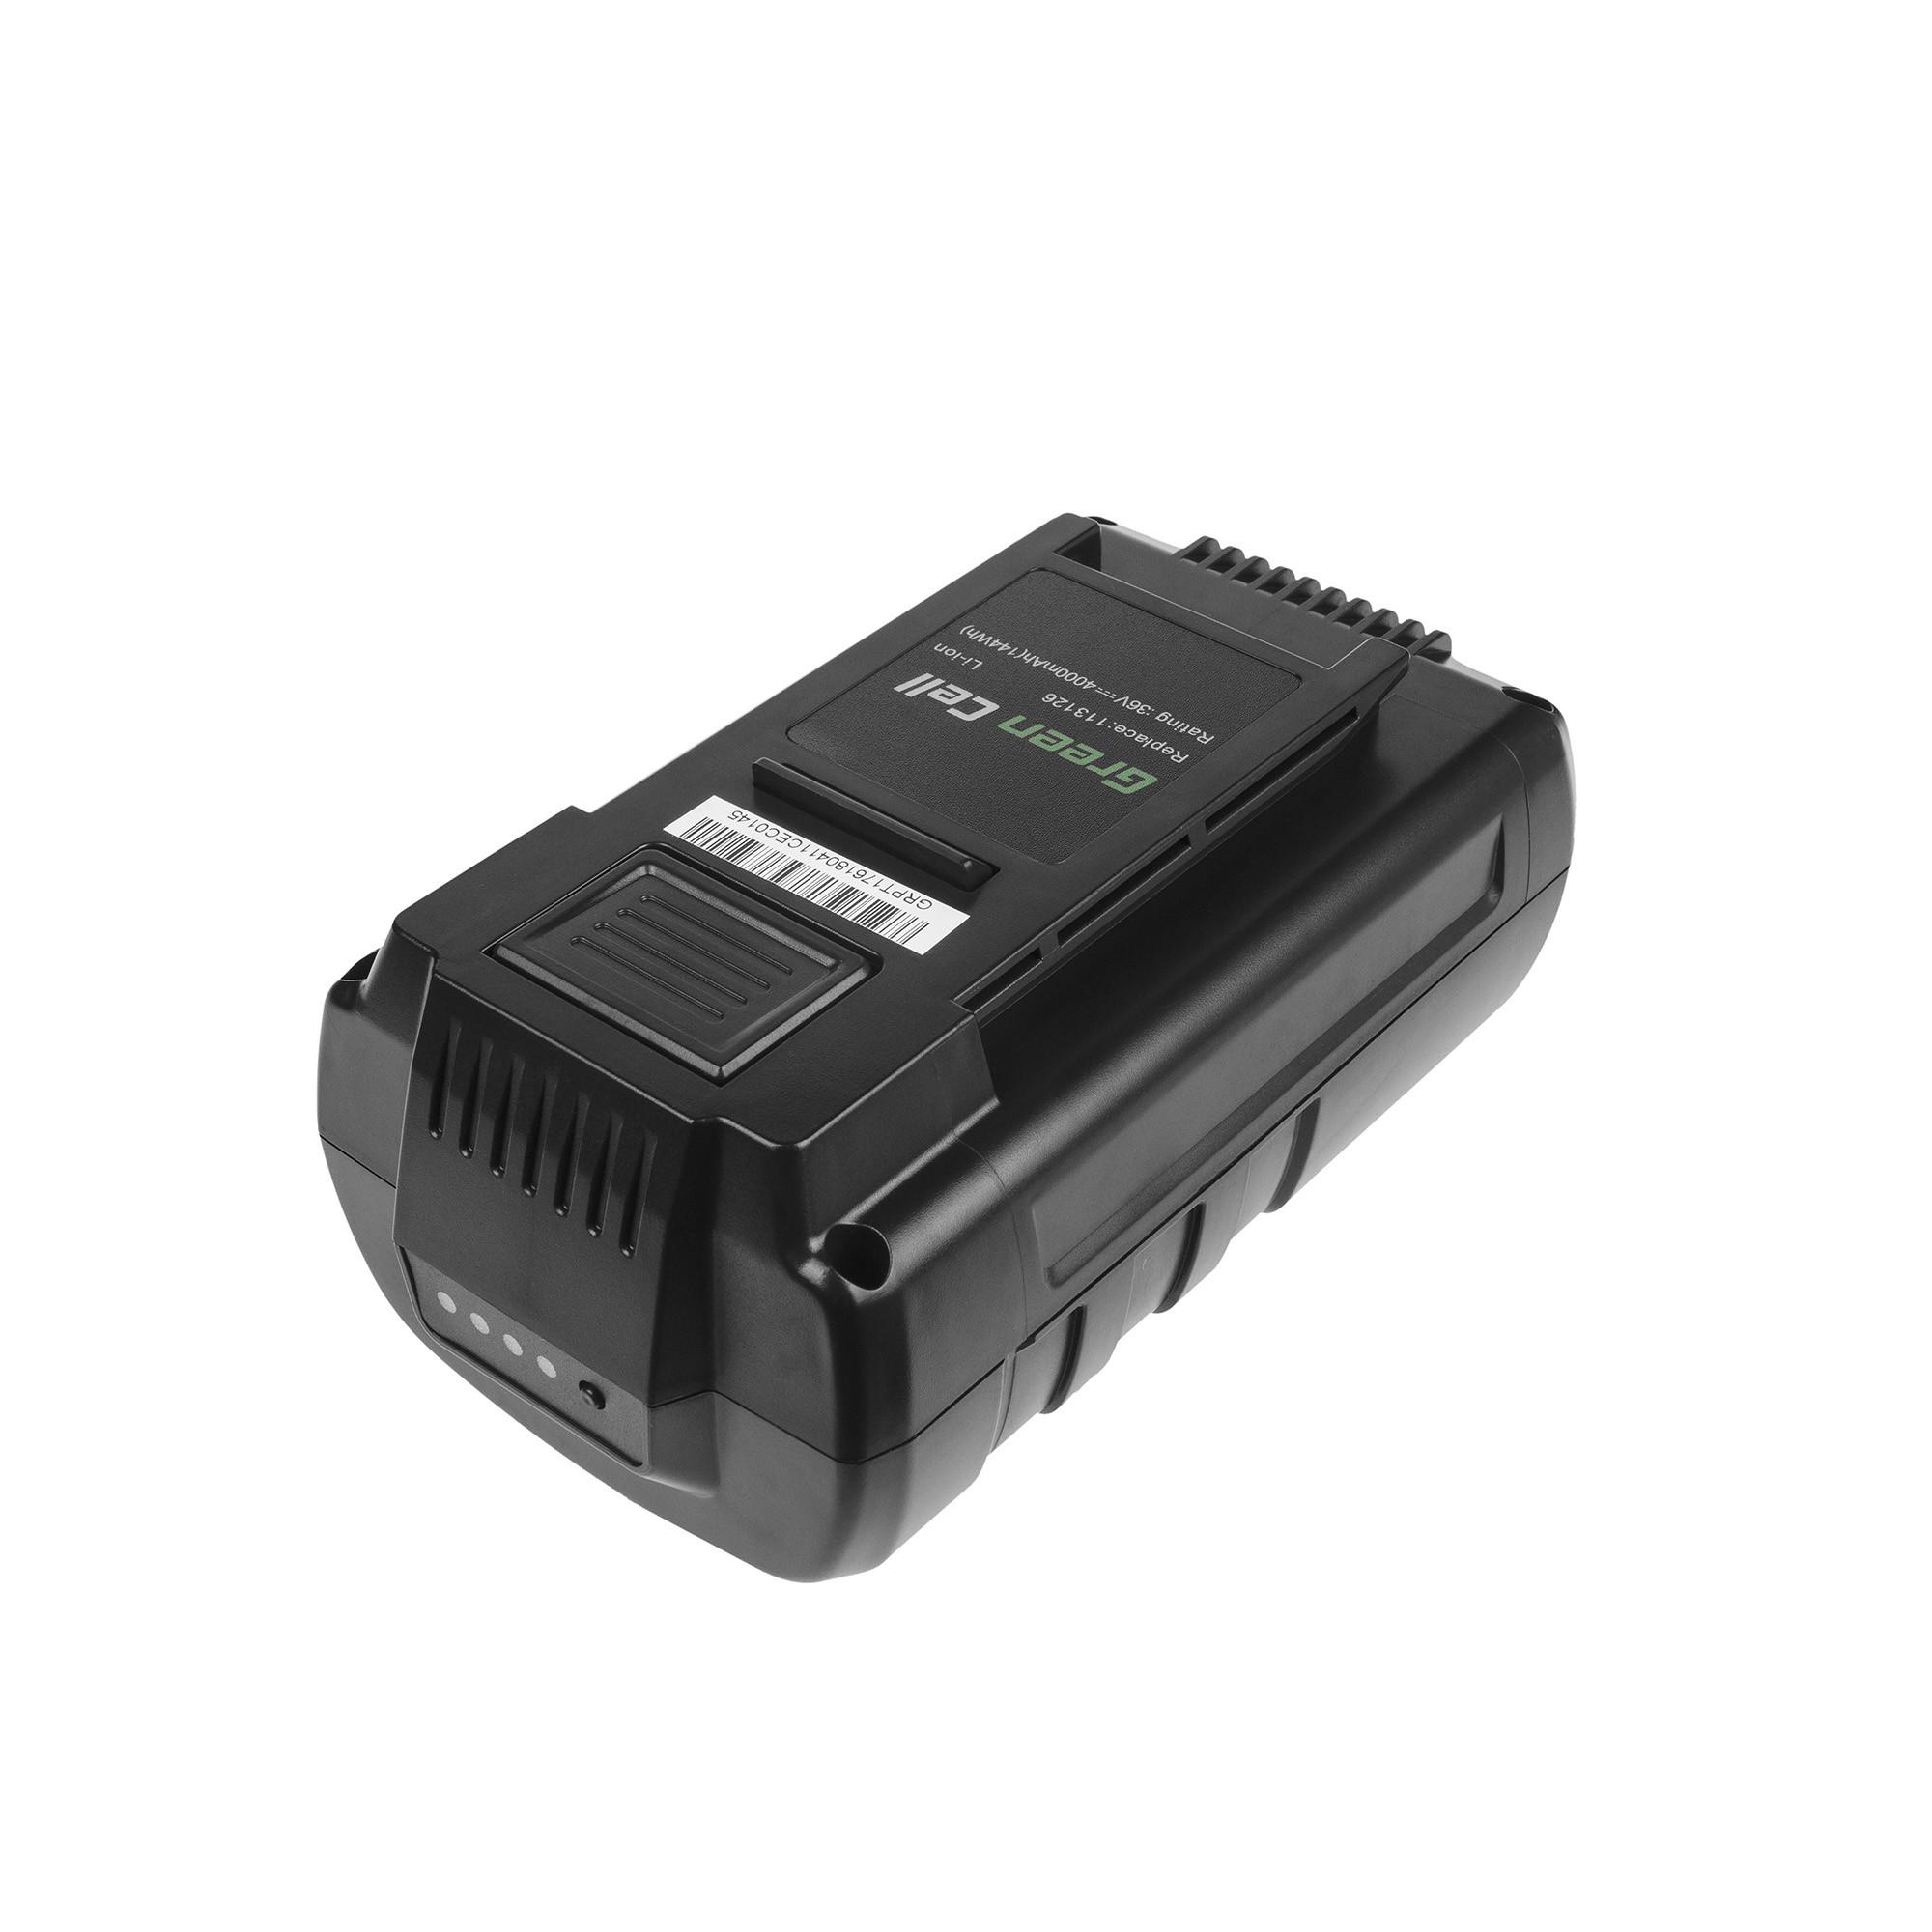 Baterie Green Cell Energy Flex 36V GC pro AL-KO 38.4 LI Comfort GT HT LB 36 Li Moweo 38.5 42.5 46.5 4000mAh Li-ion - neoriginální